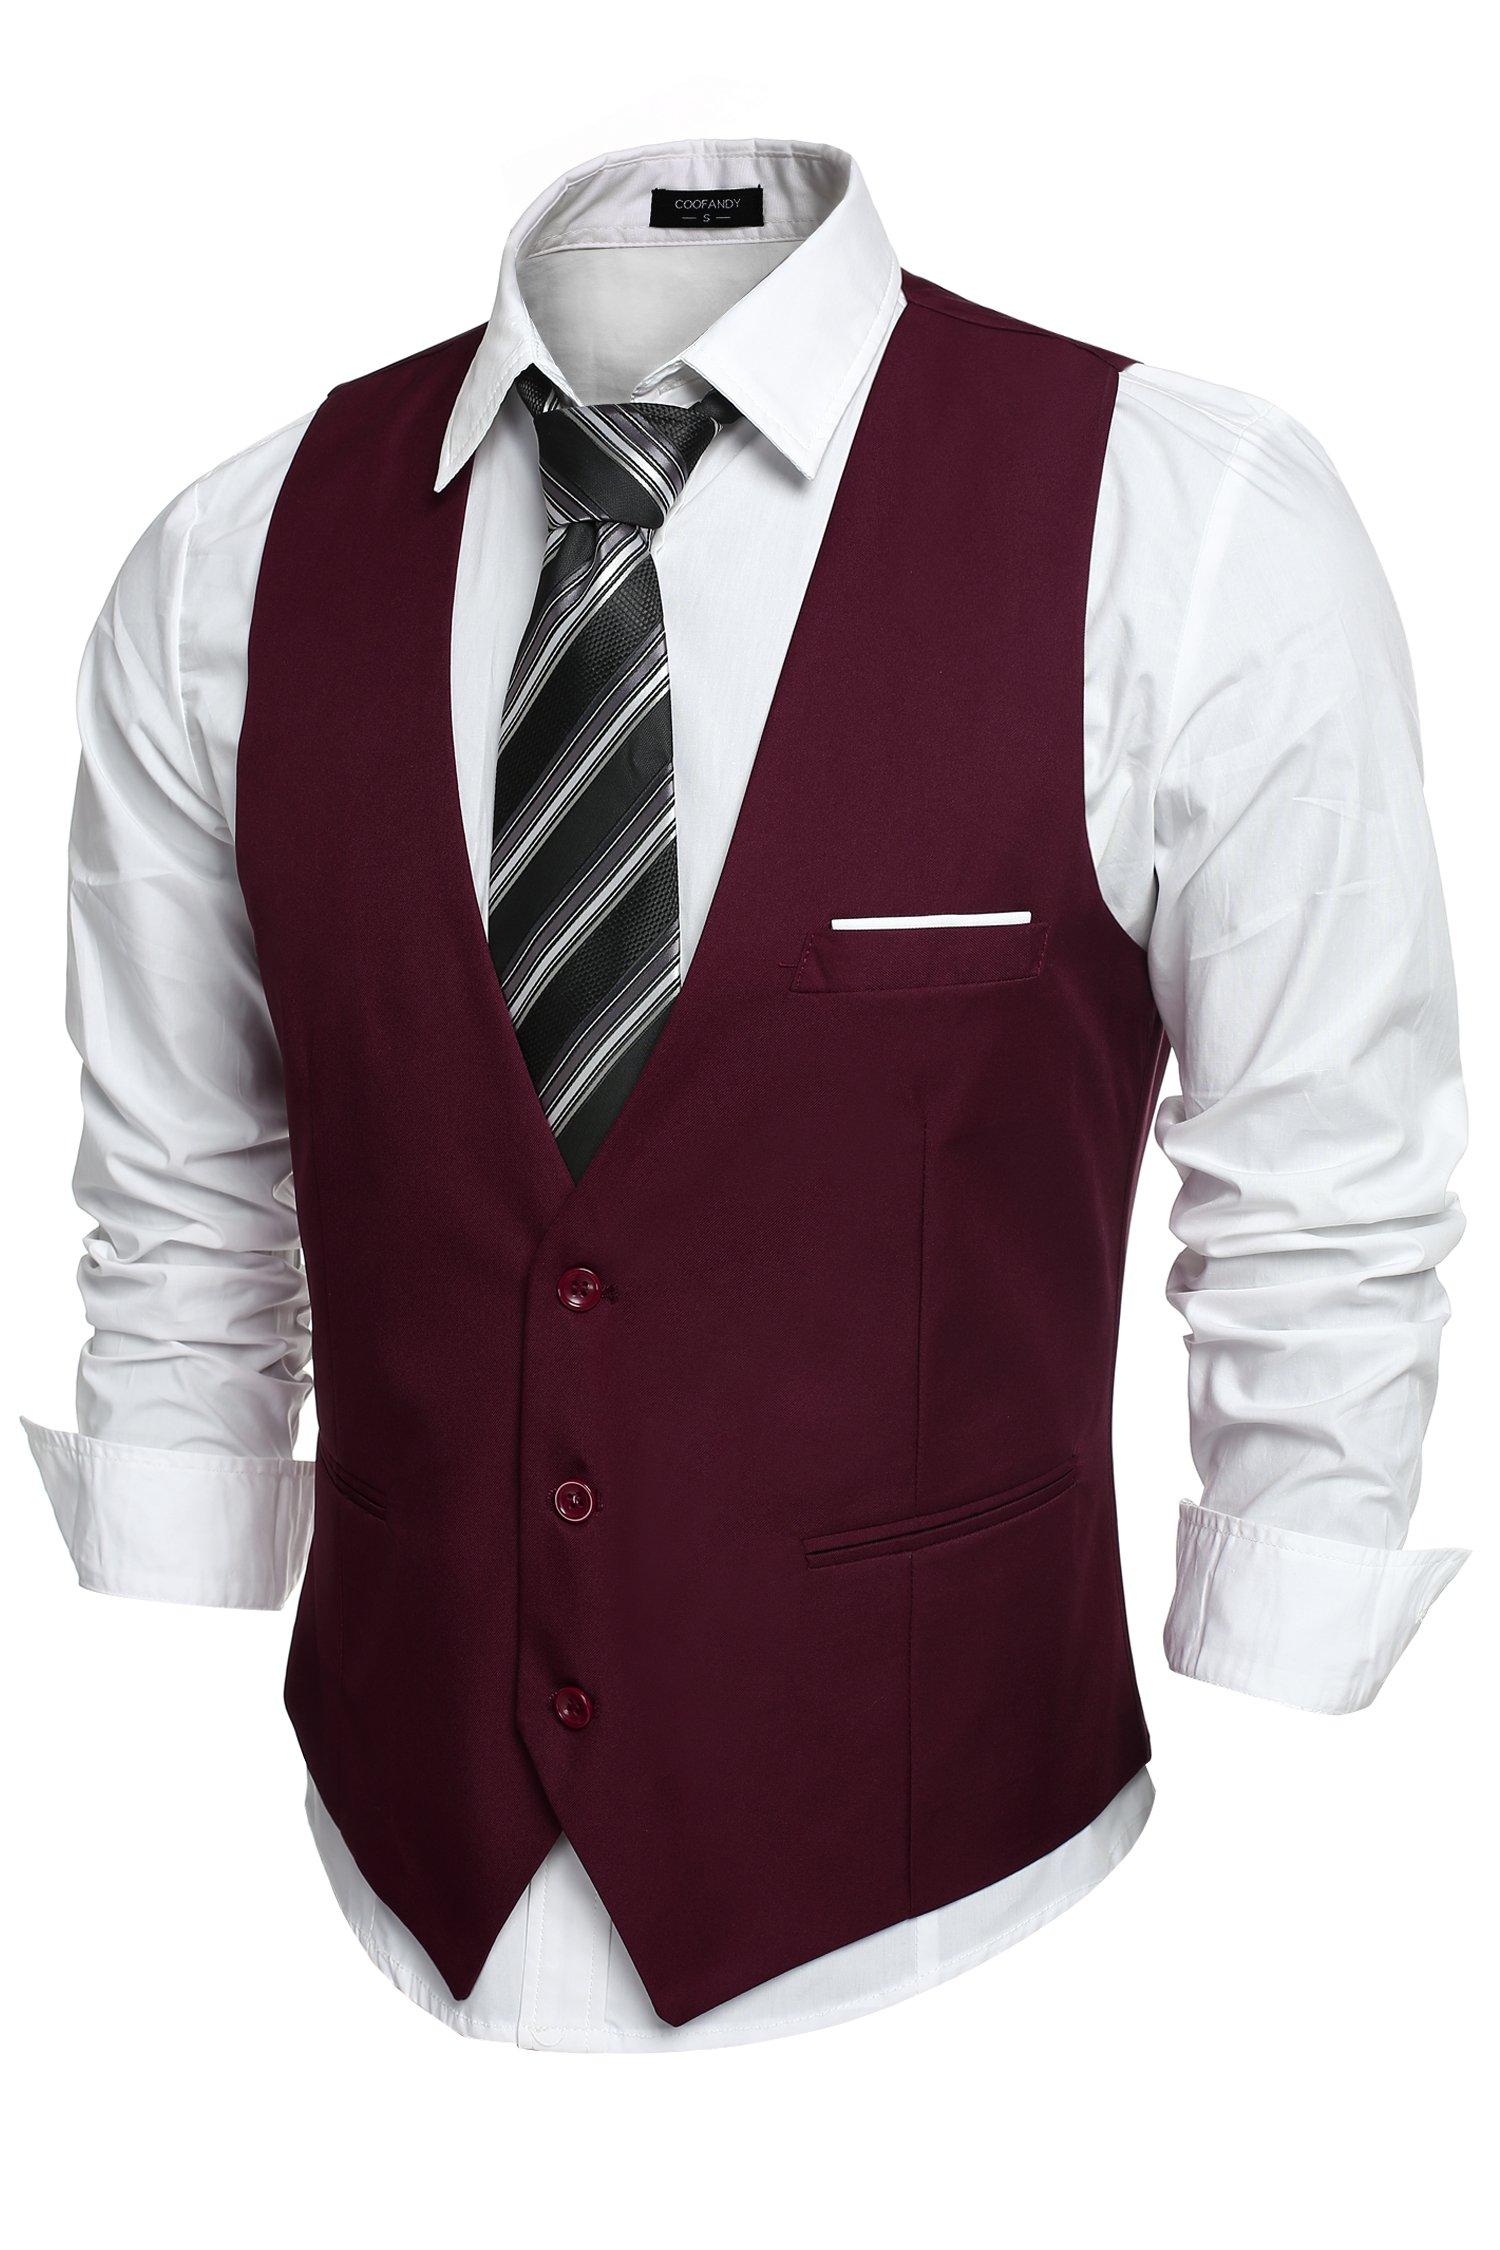 COOFANDY Men's V-Neck Sleeveless Business Suit Vests Slim Fit Wedding Waistcoat, Type-02 Wine Red, Medium